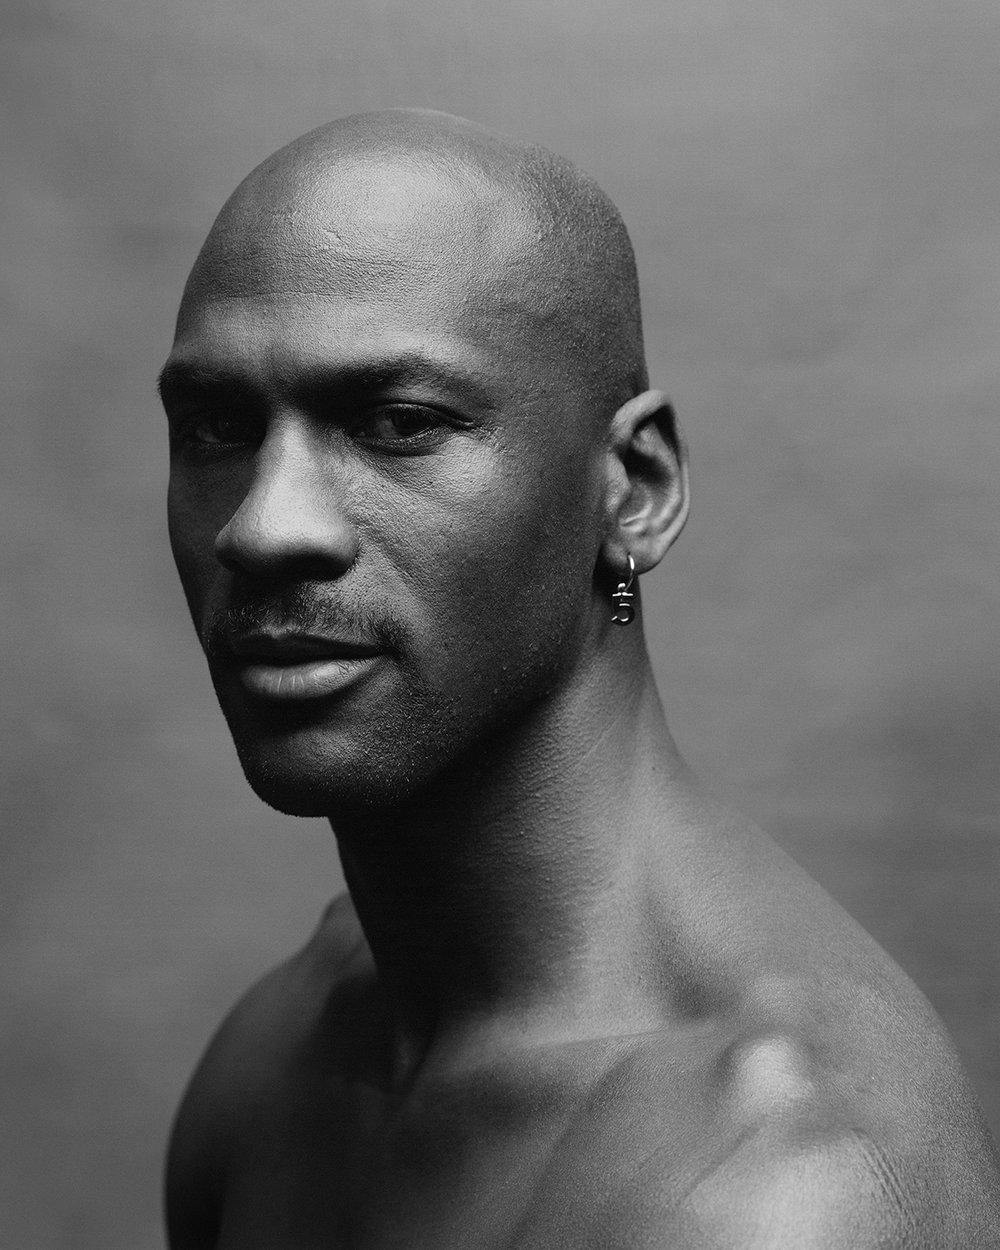 Michael Jordan, 1998